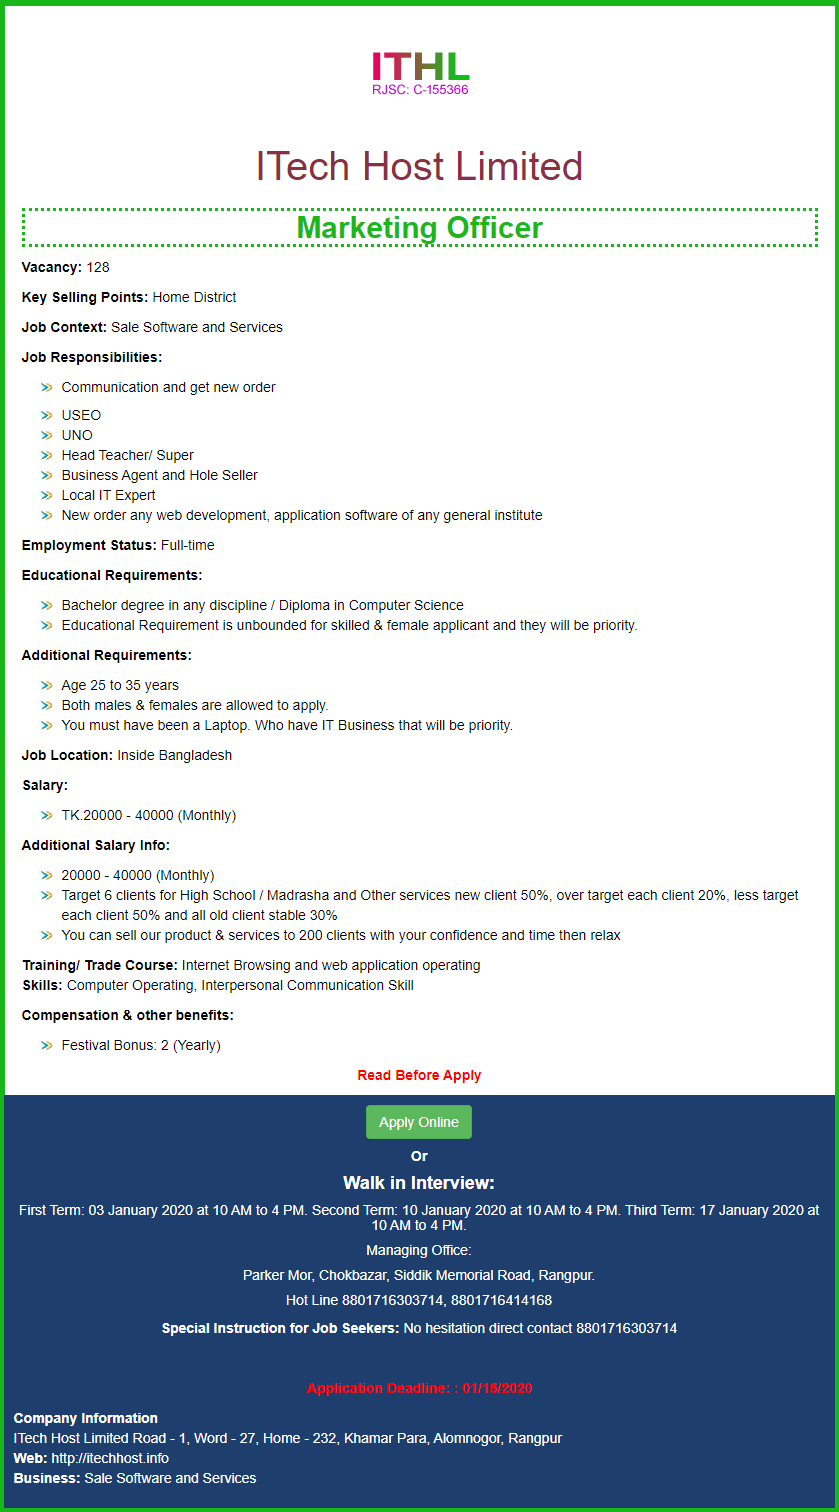 ITech Host Limited job circular